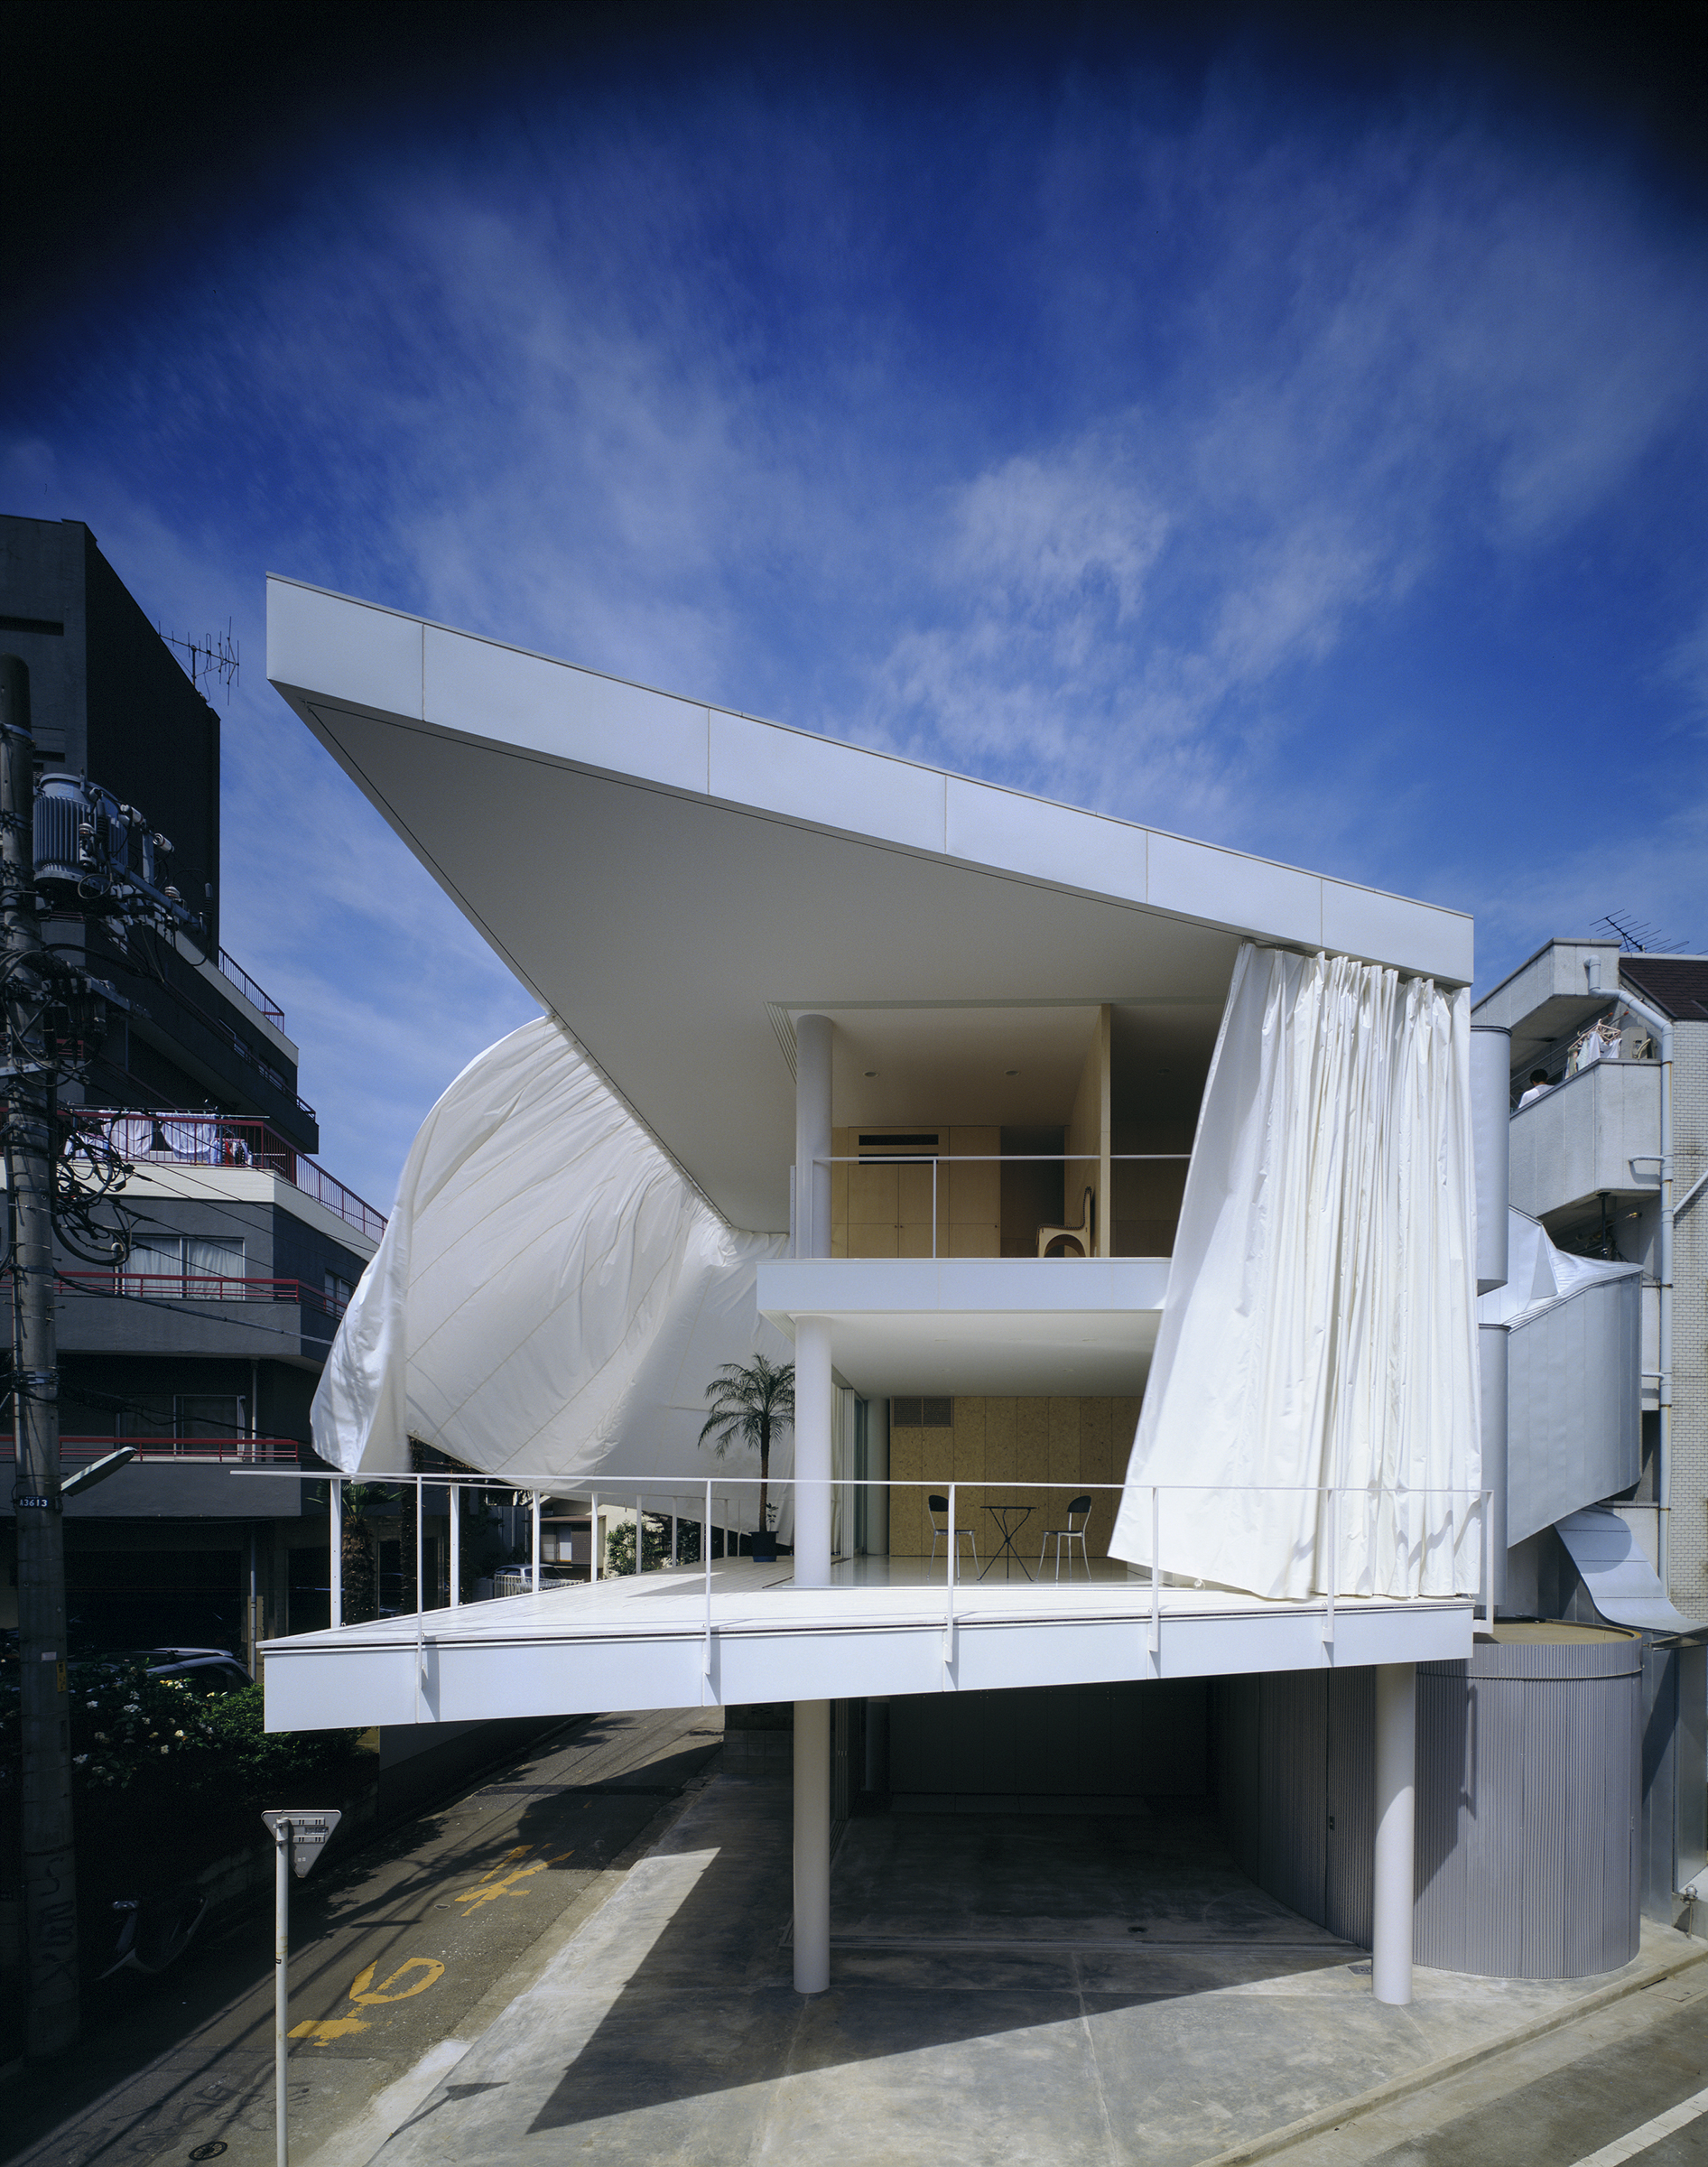 bio shigeru ban 2014 pritzker architecture prize metalocus. Black Bedroom Furniture Sets. Home Design Ideas